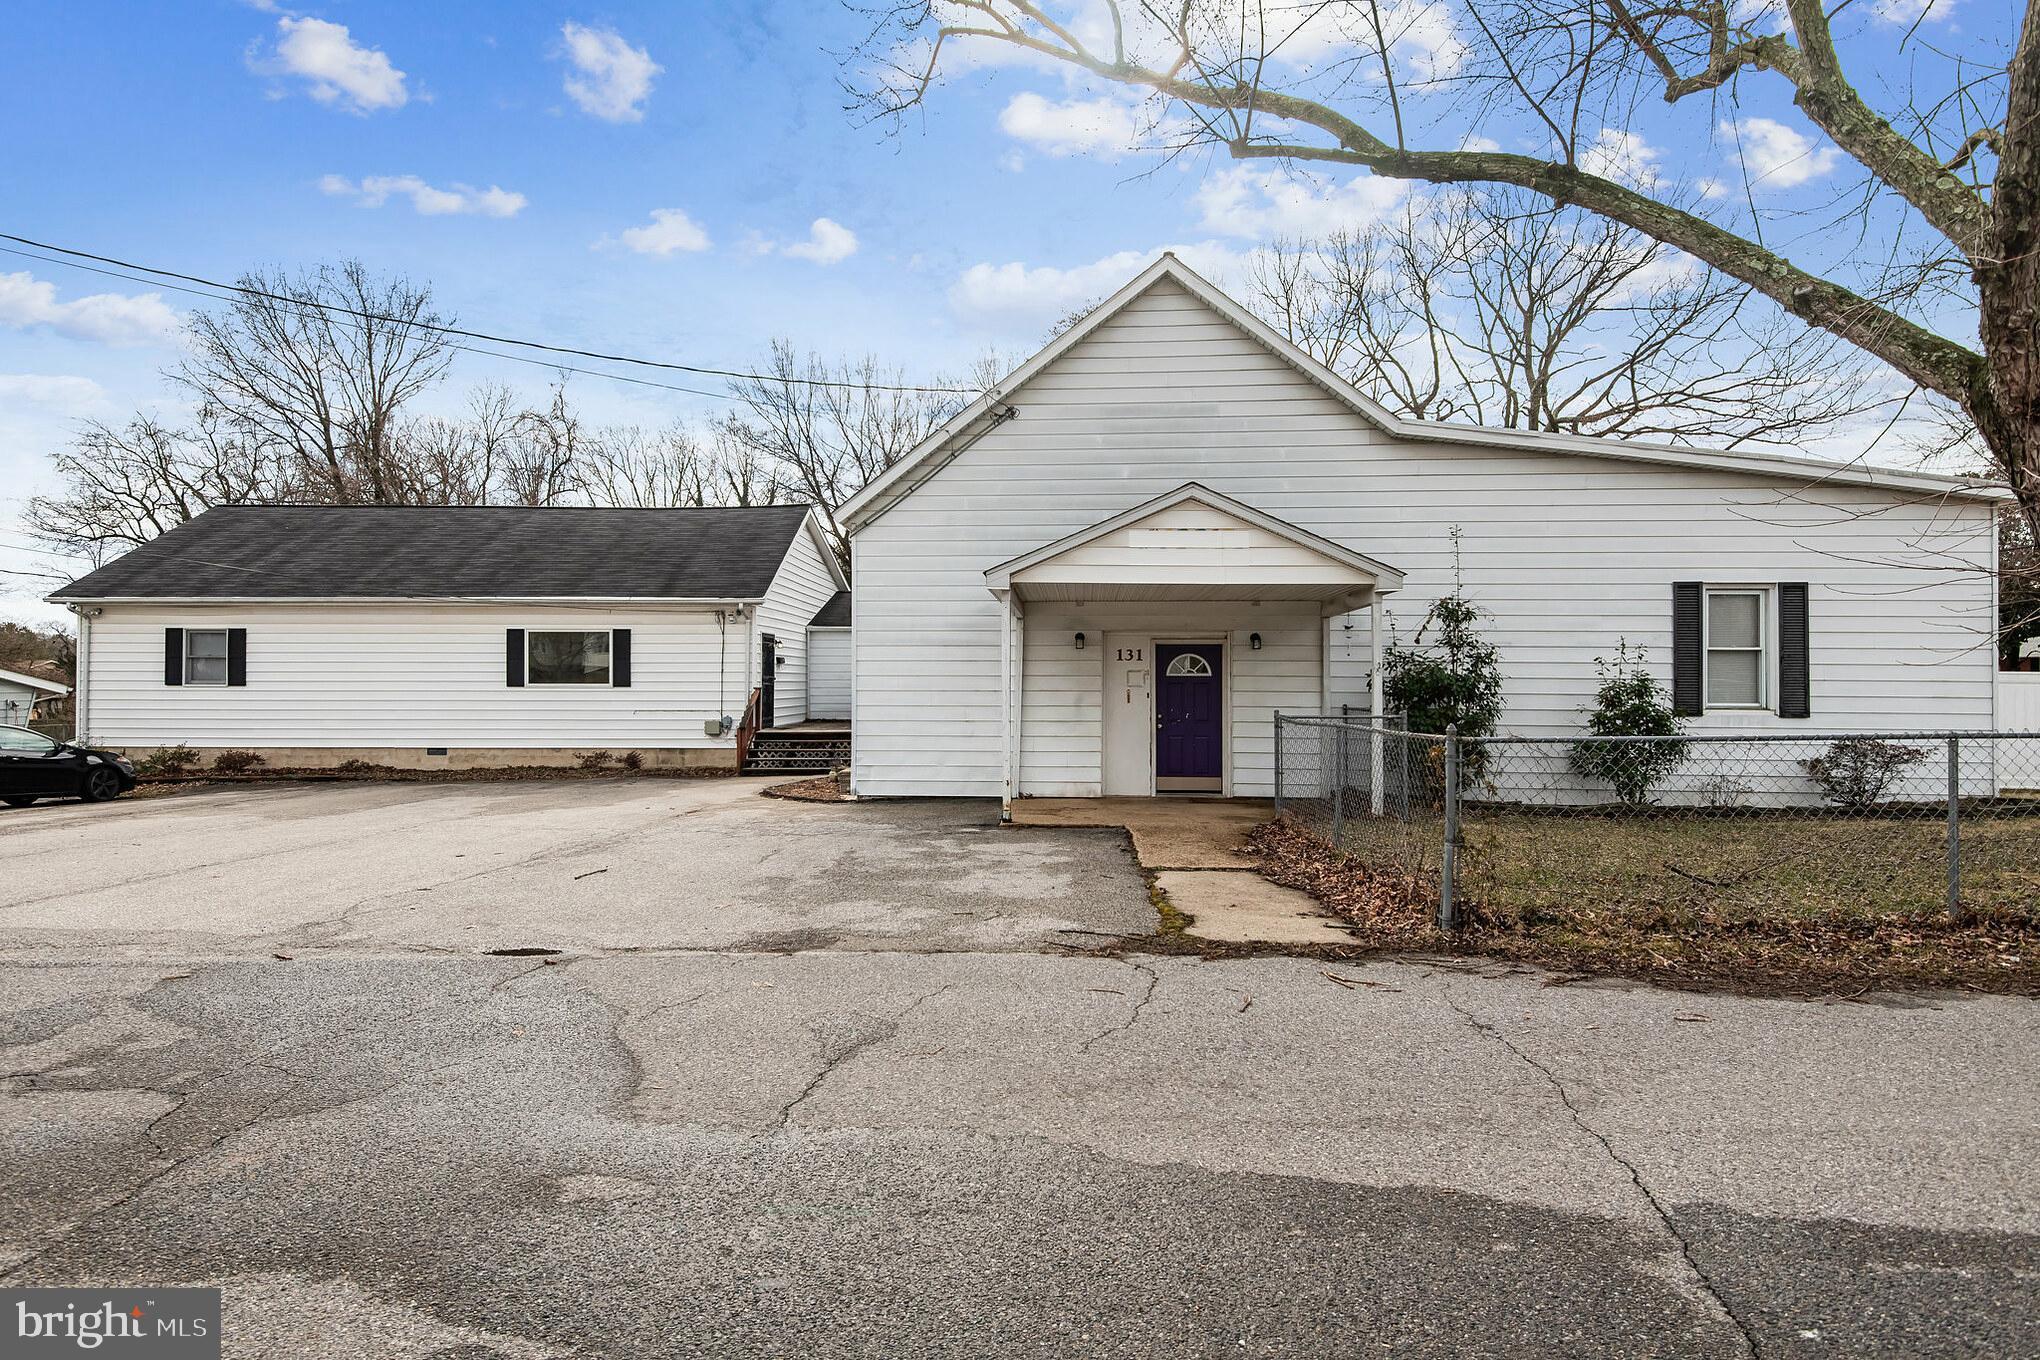 131 MIDLAND ROAD, GLEN BURNIE, Maryland 21060, 2 Bedrooms Bedrooms, ,2 BathroomsBathrooms,Single Family,For Sale,131 MIDLAND ROAD,MDAA460208